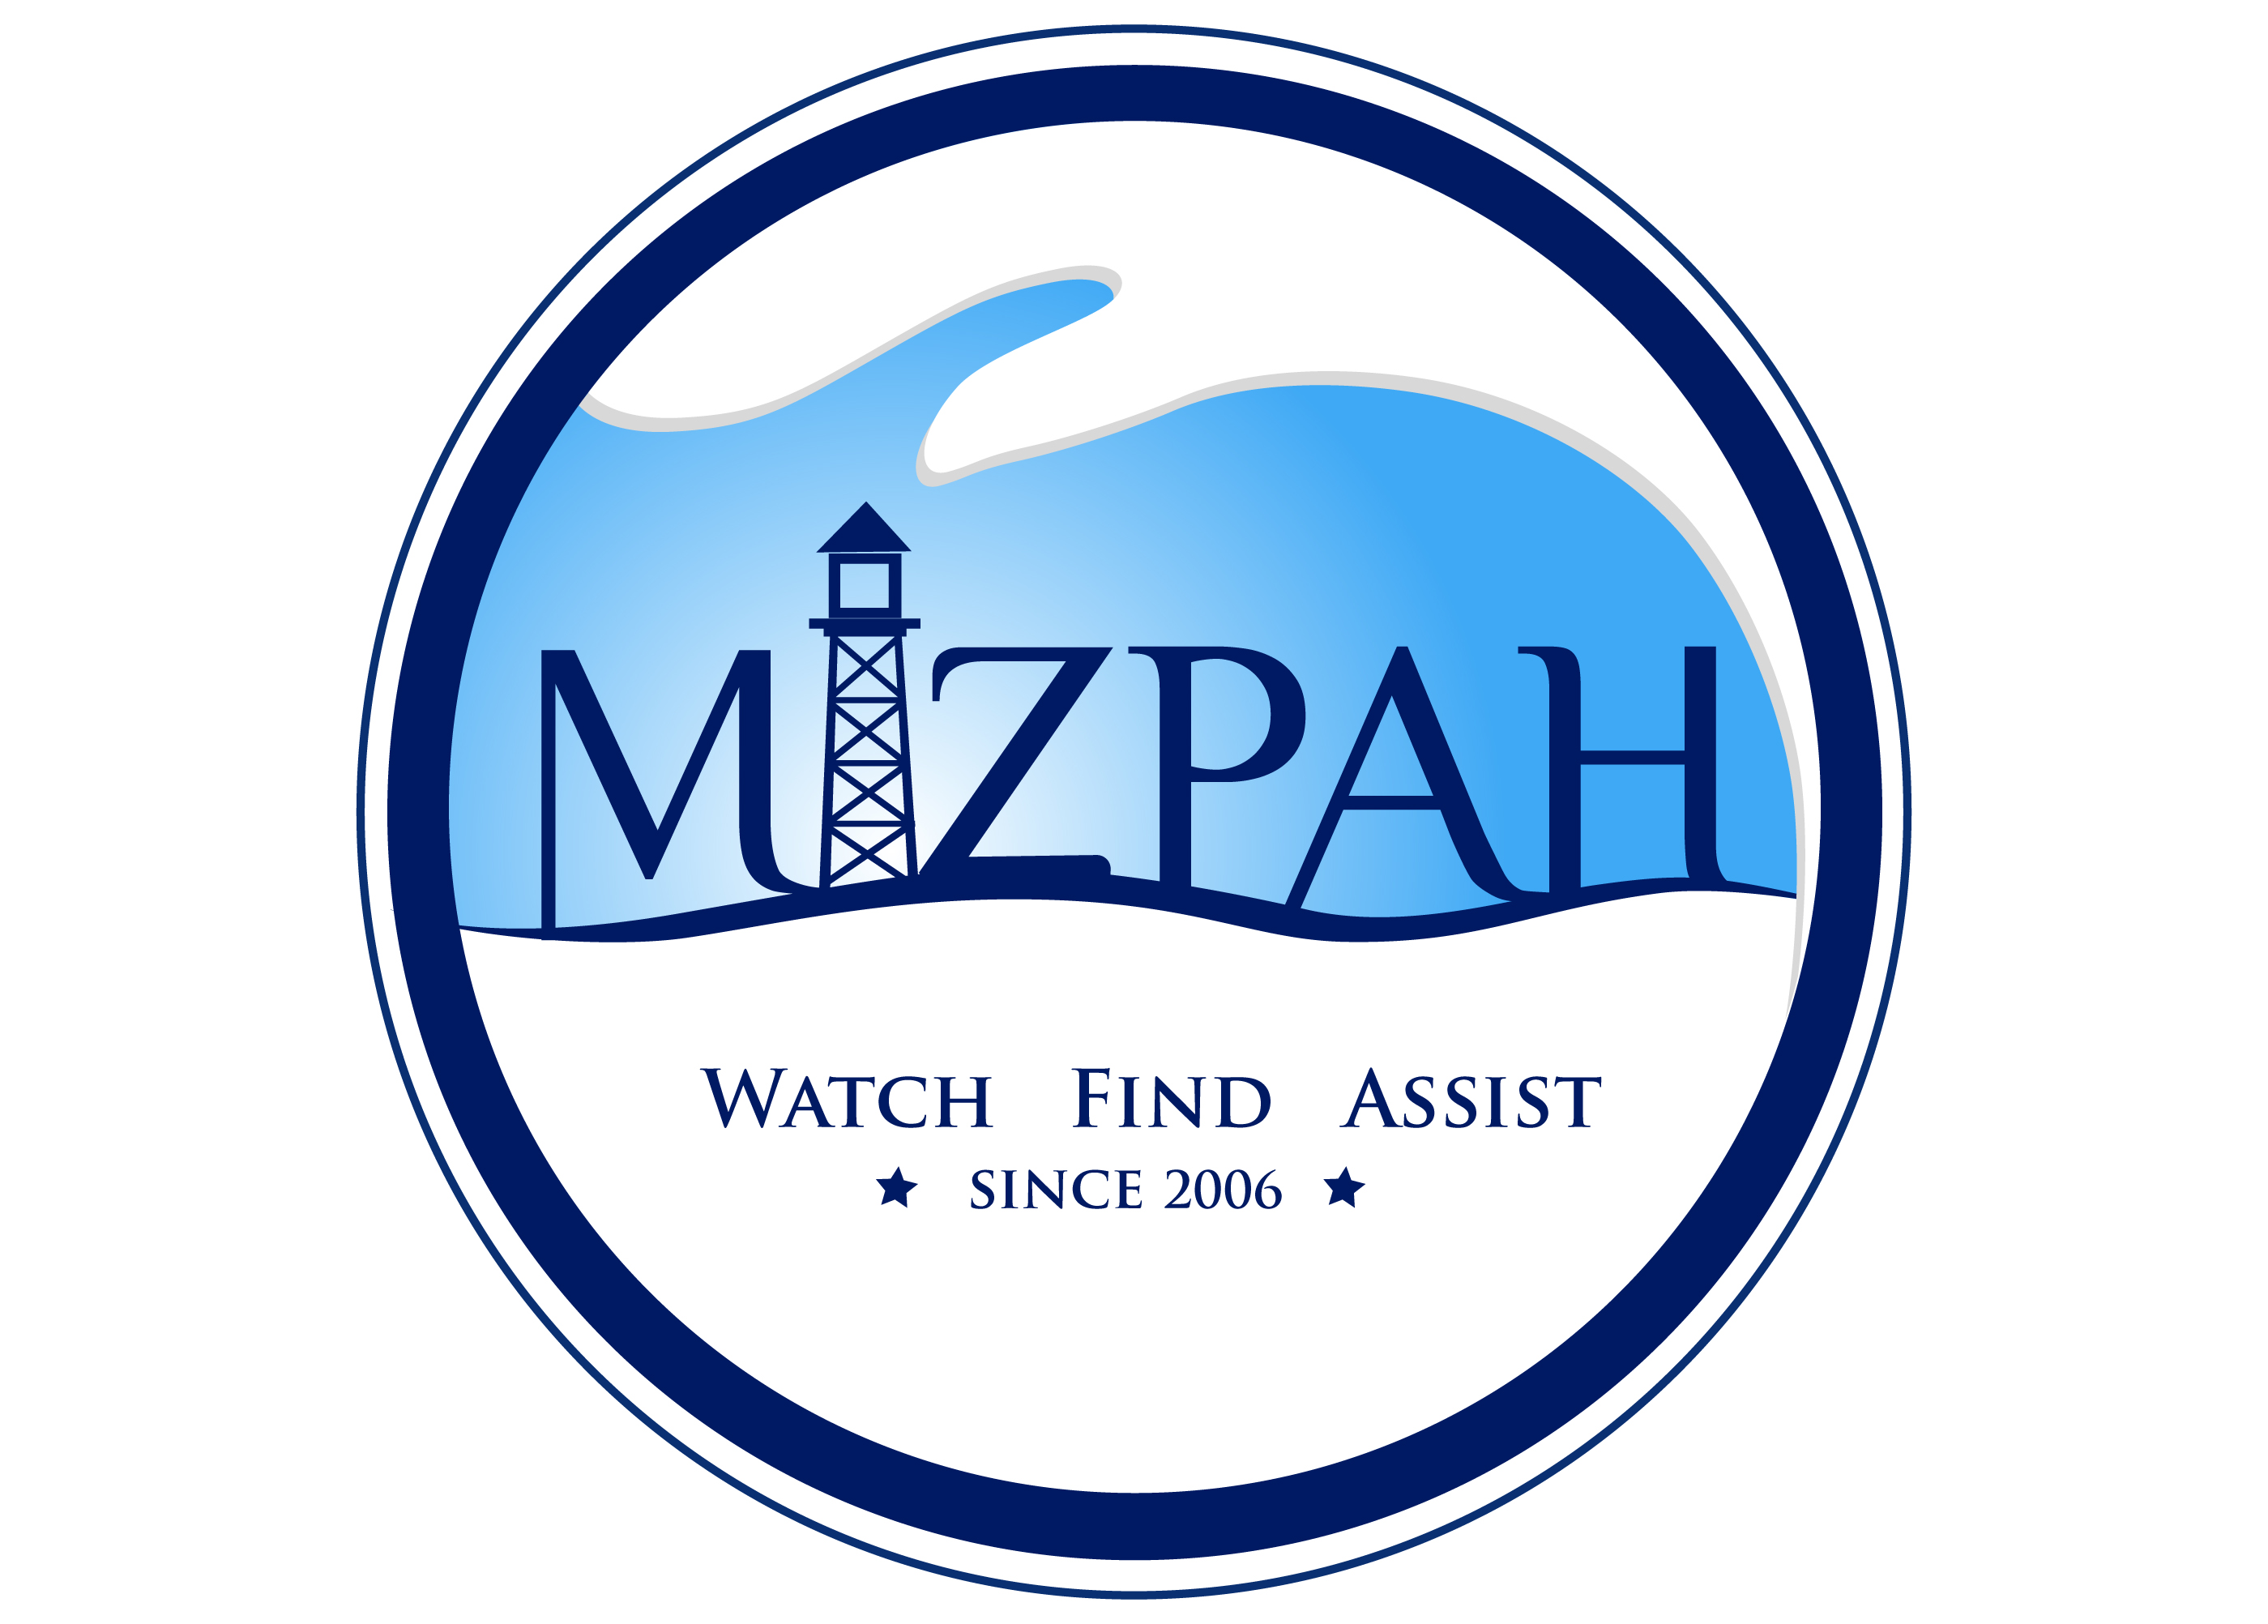 MIZPAH SOCIAL SERVICE ORGANIZATION